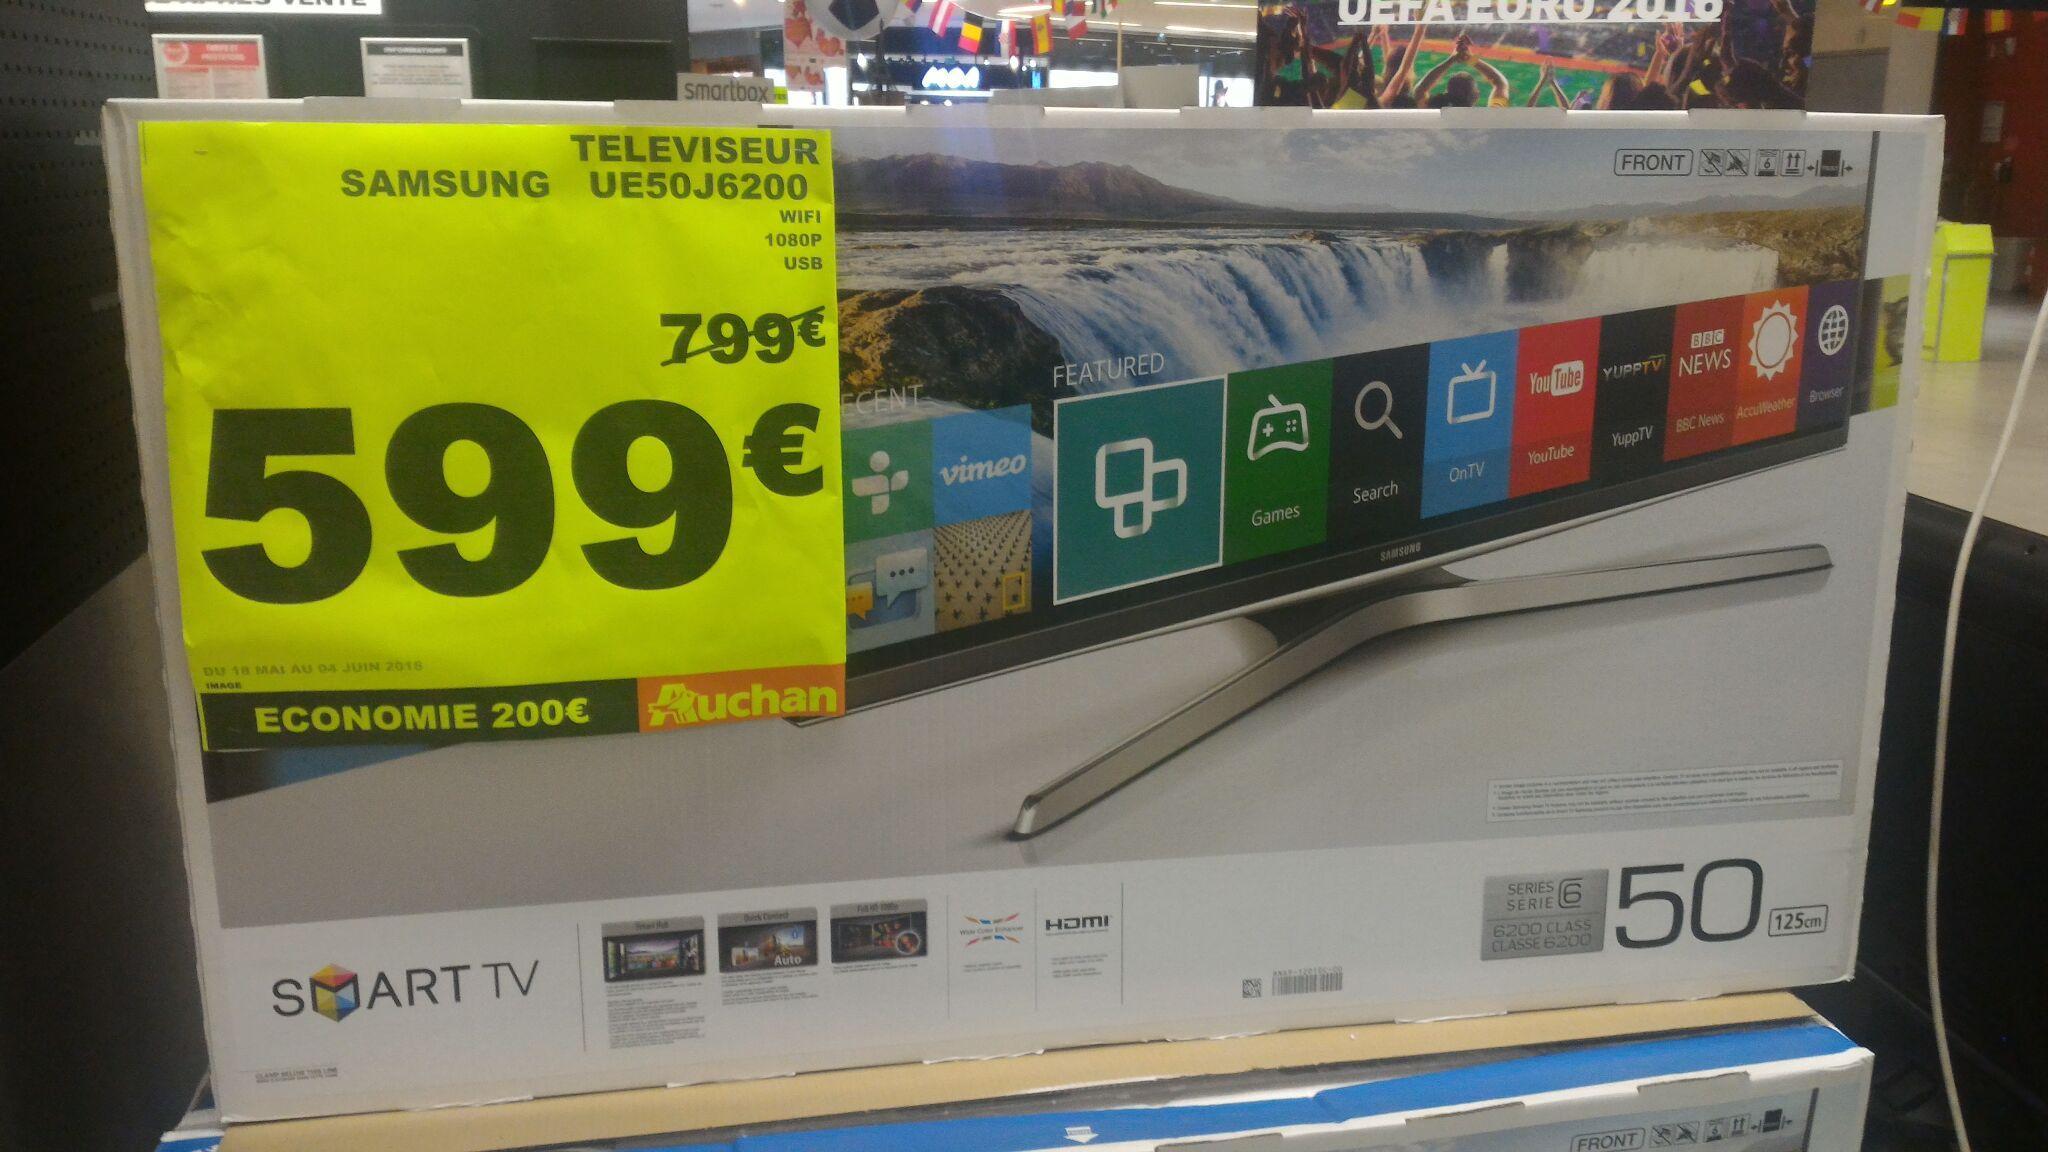 "TV 50"" SamsungUE50J6200 - Smart TV, LED, Full HD"